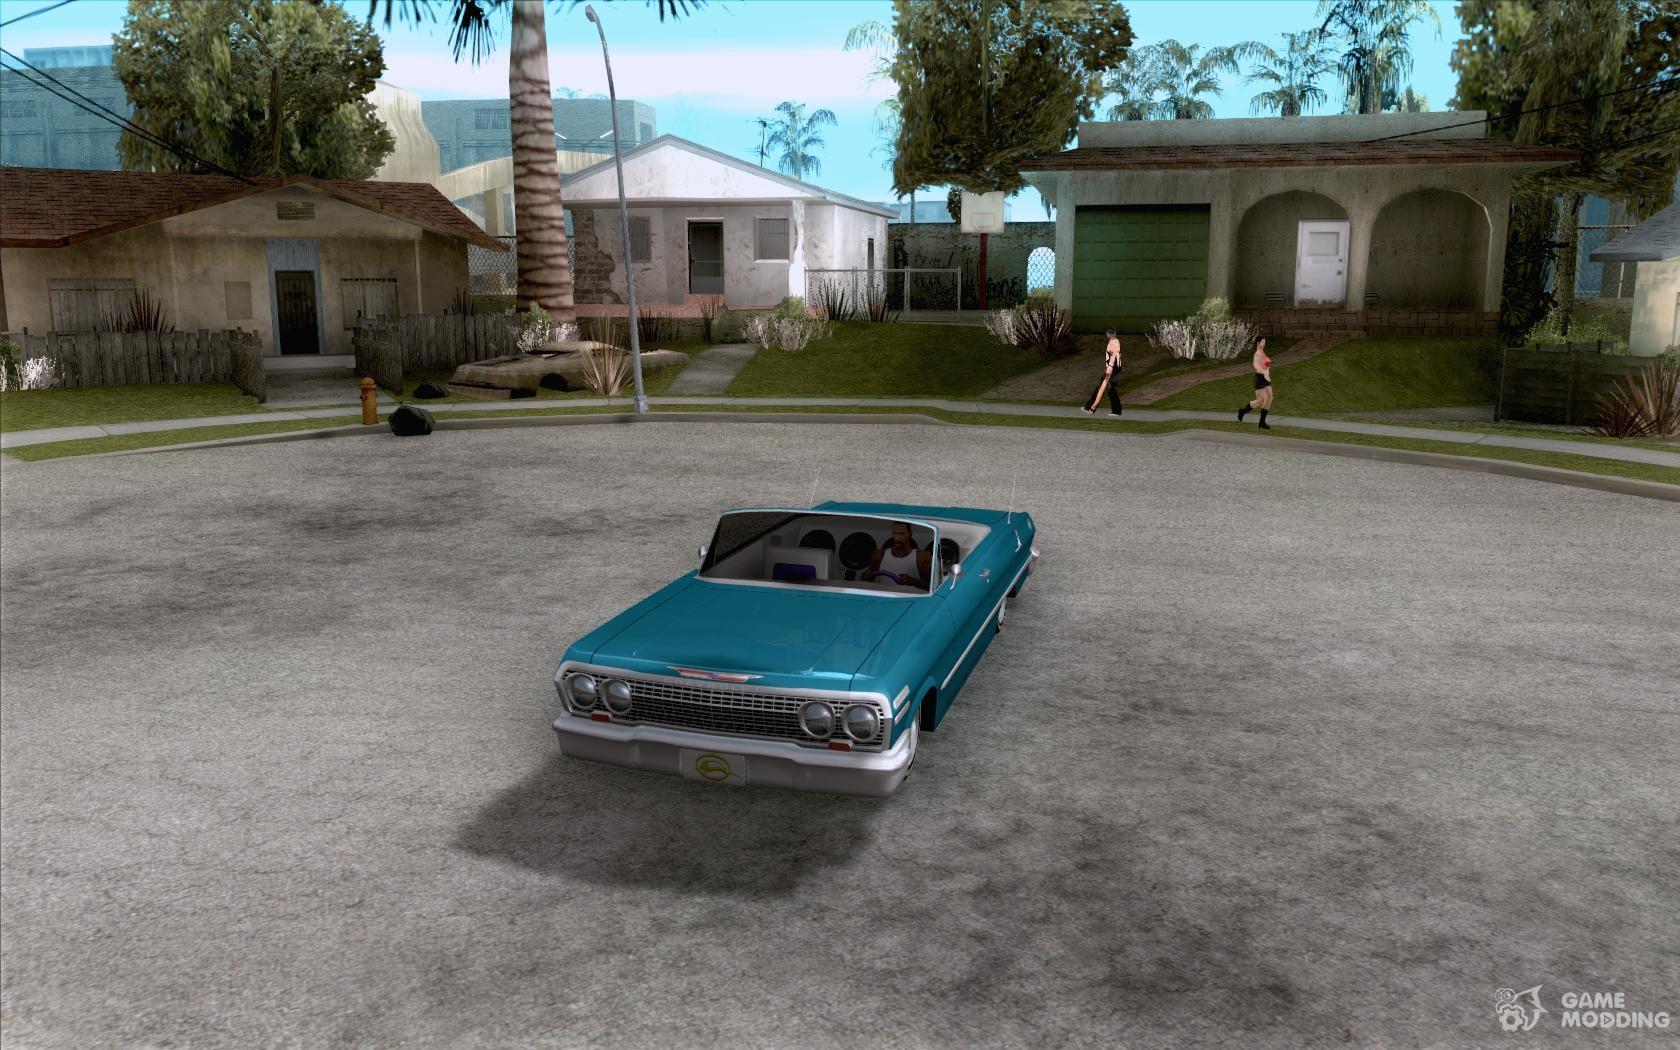 Chevrolet impala 4 door hardtop 1963 for gta san andreas - Chevrolet Impala Hardtop 1963 For Gta San Andreas